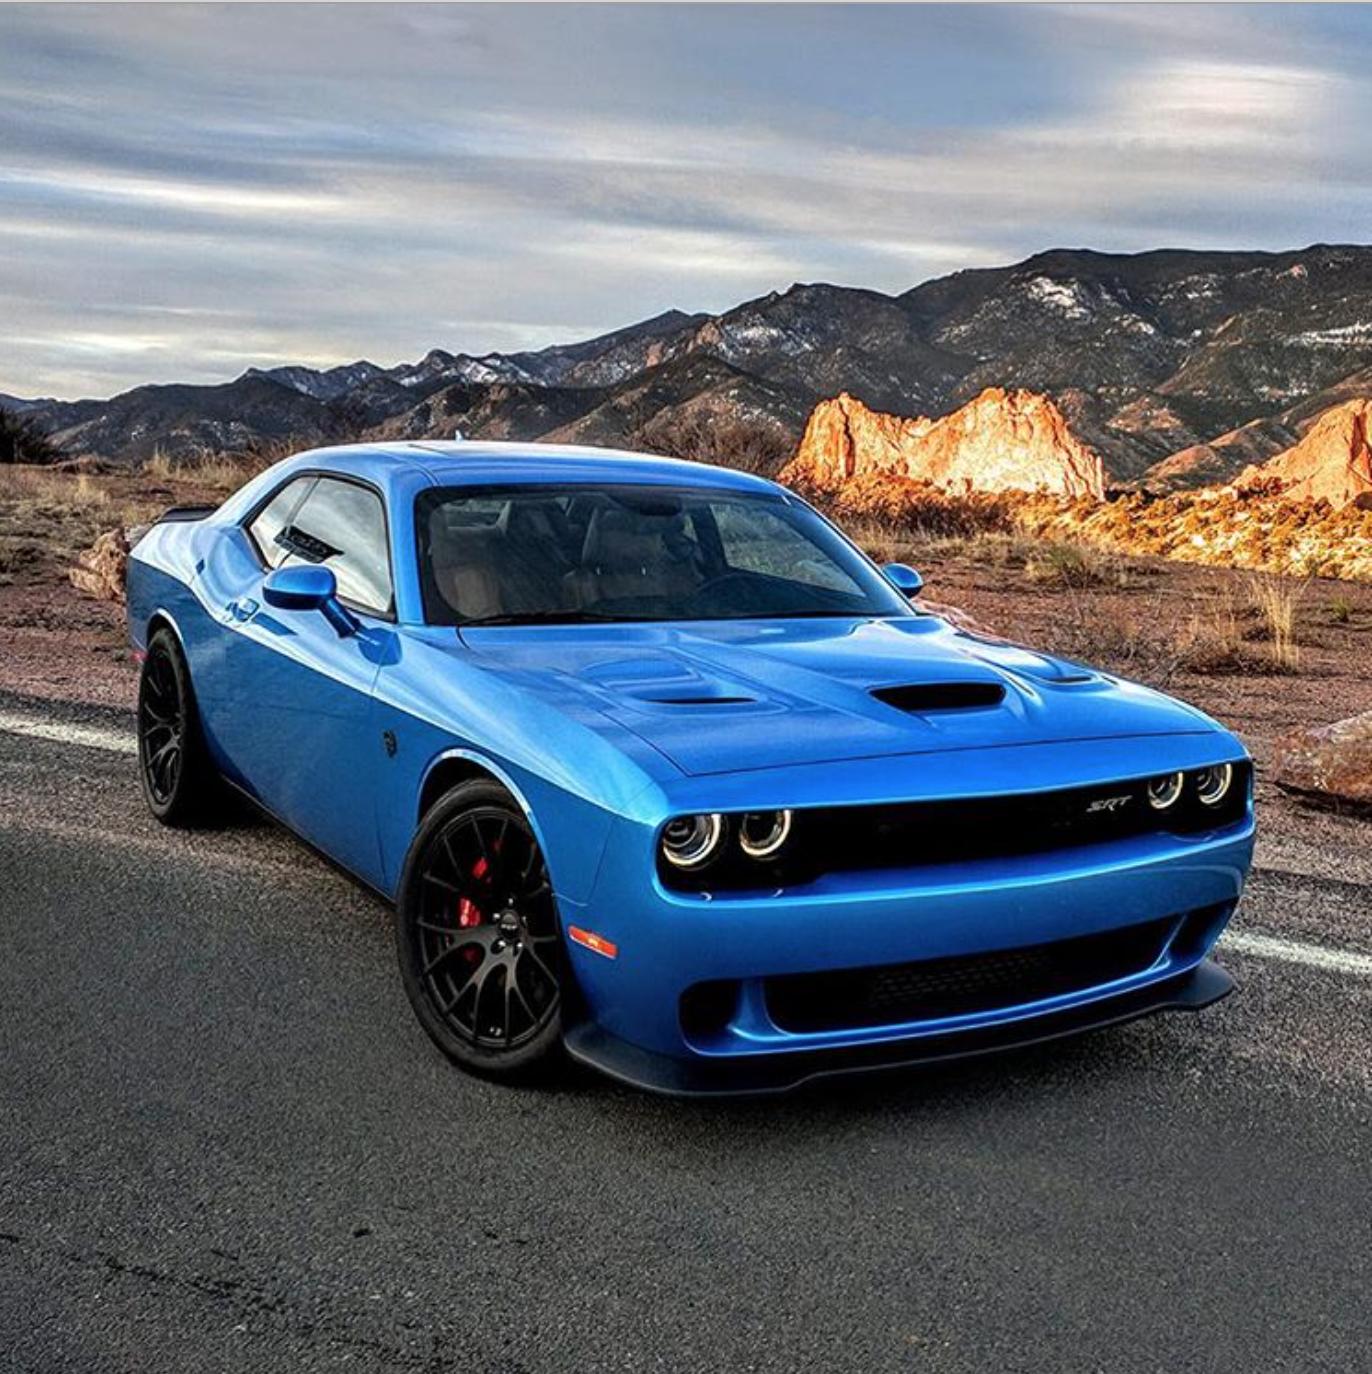 Dodge Challenger Hellcat Blue >> Dodge Challenger Srt Hellcat In B5 Blue Pearl Dodge Challenger